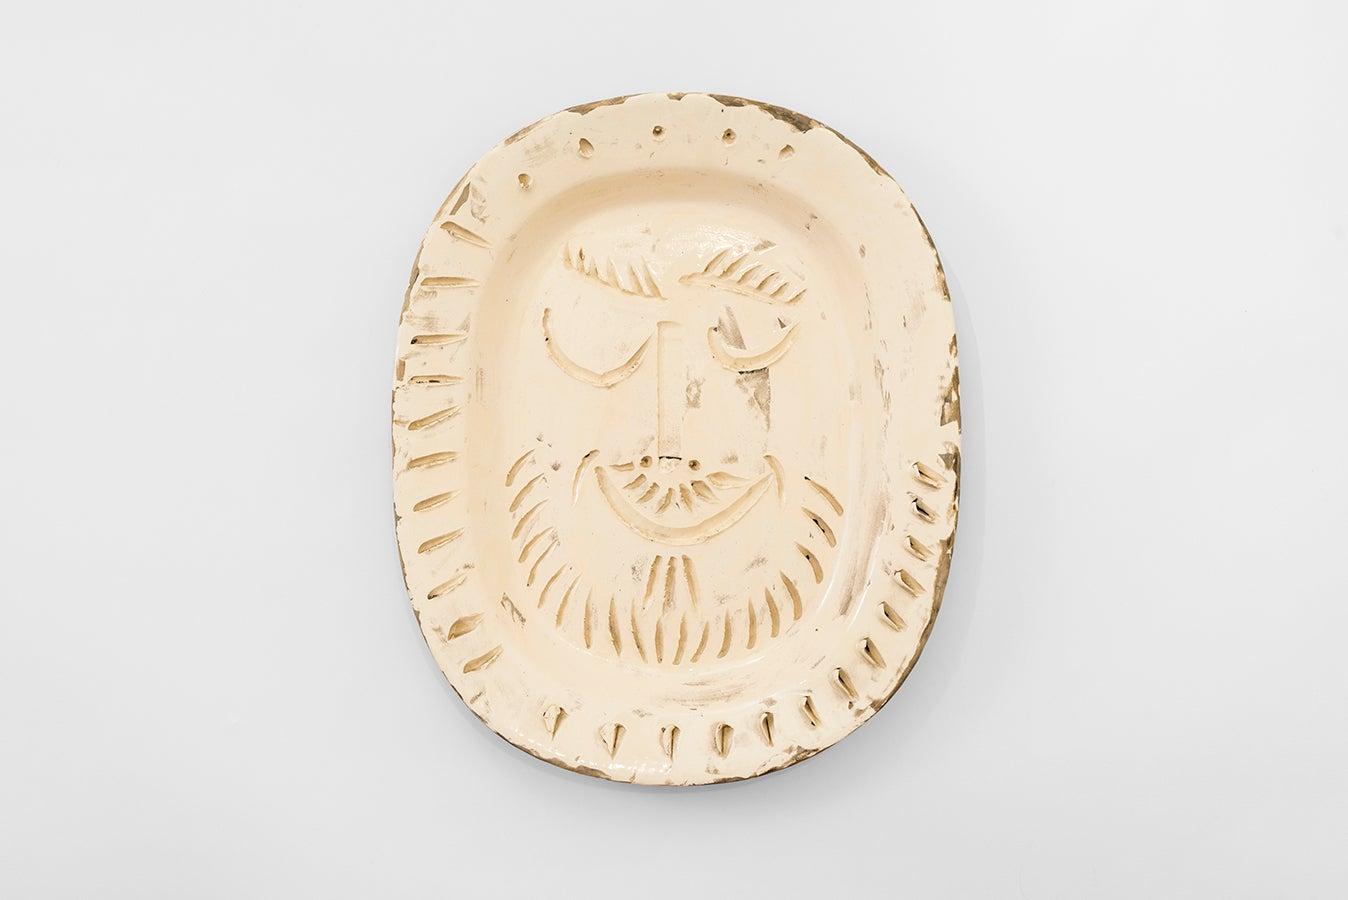 Pablo Picasso - Madoura Ceramic: Man's Face (Visage d'homme)